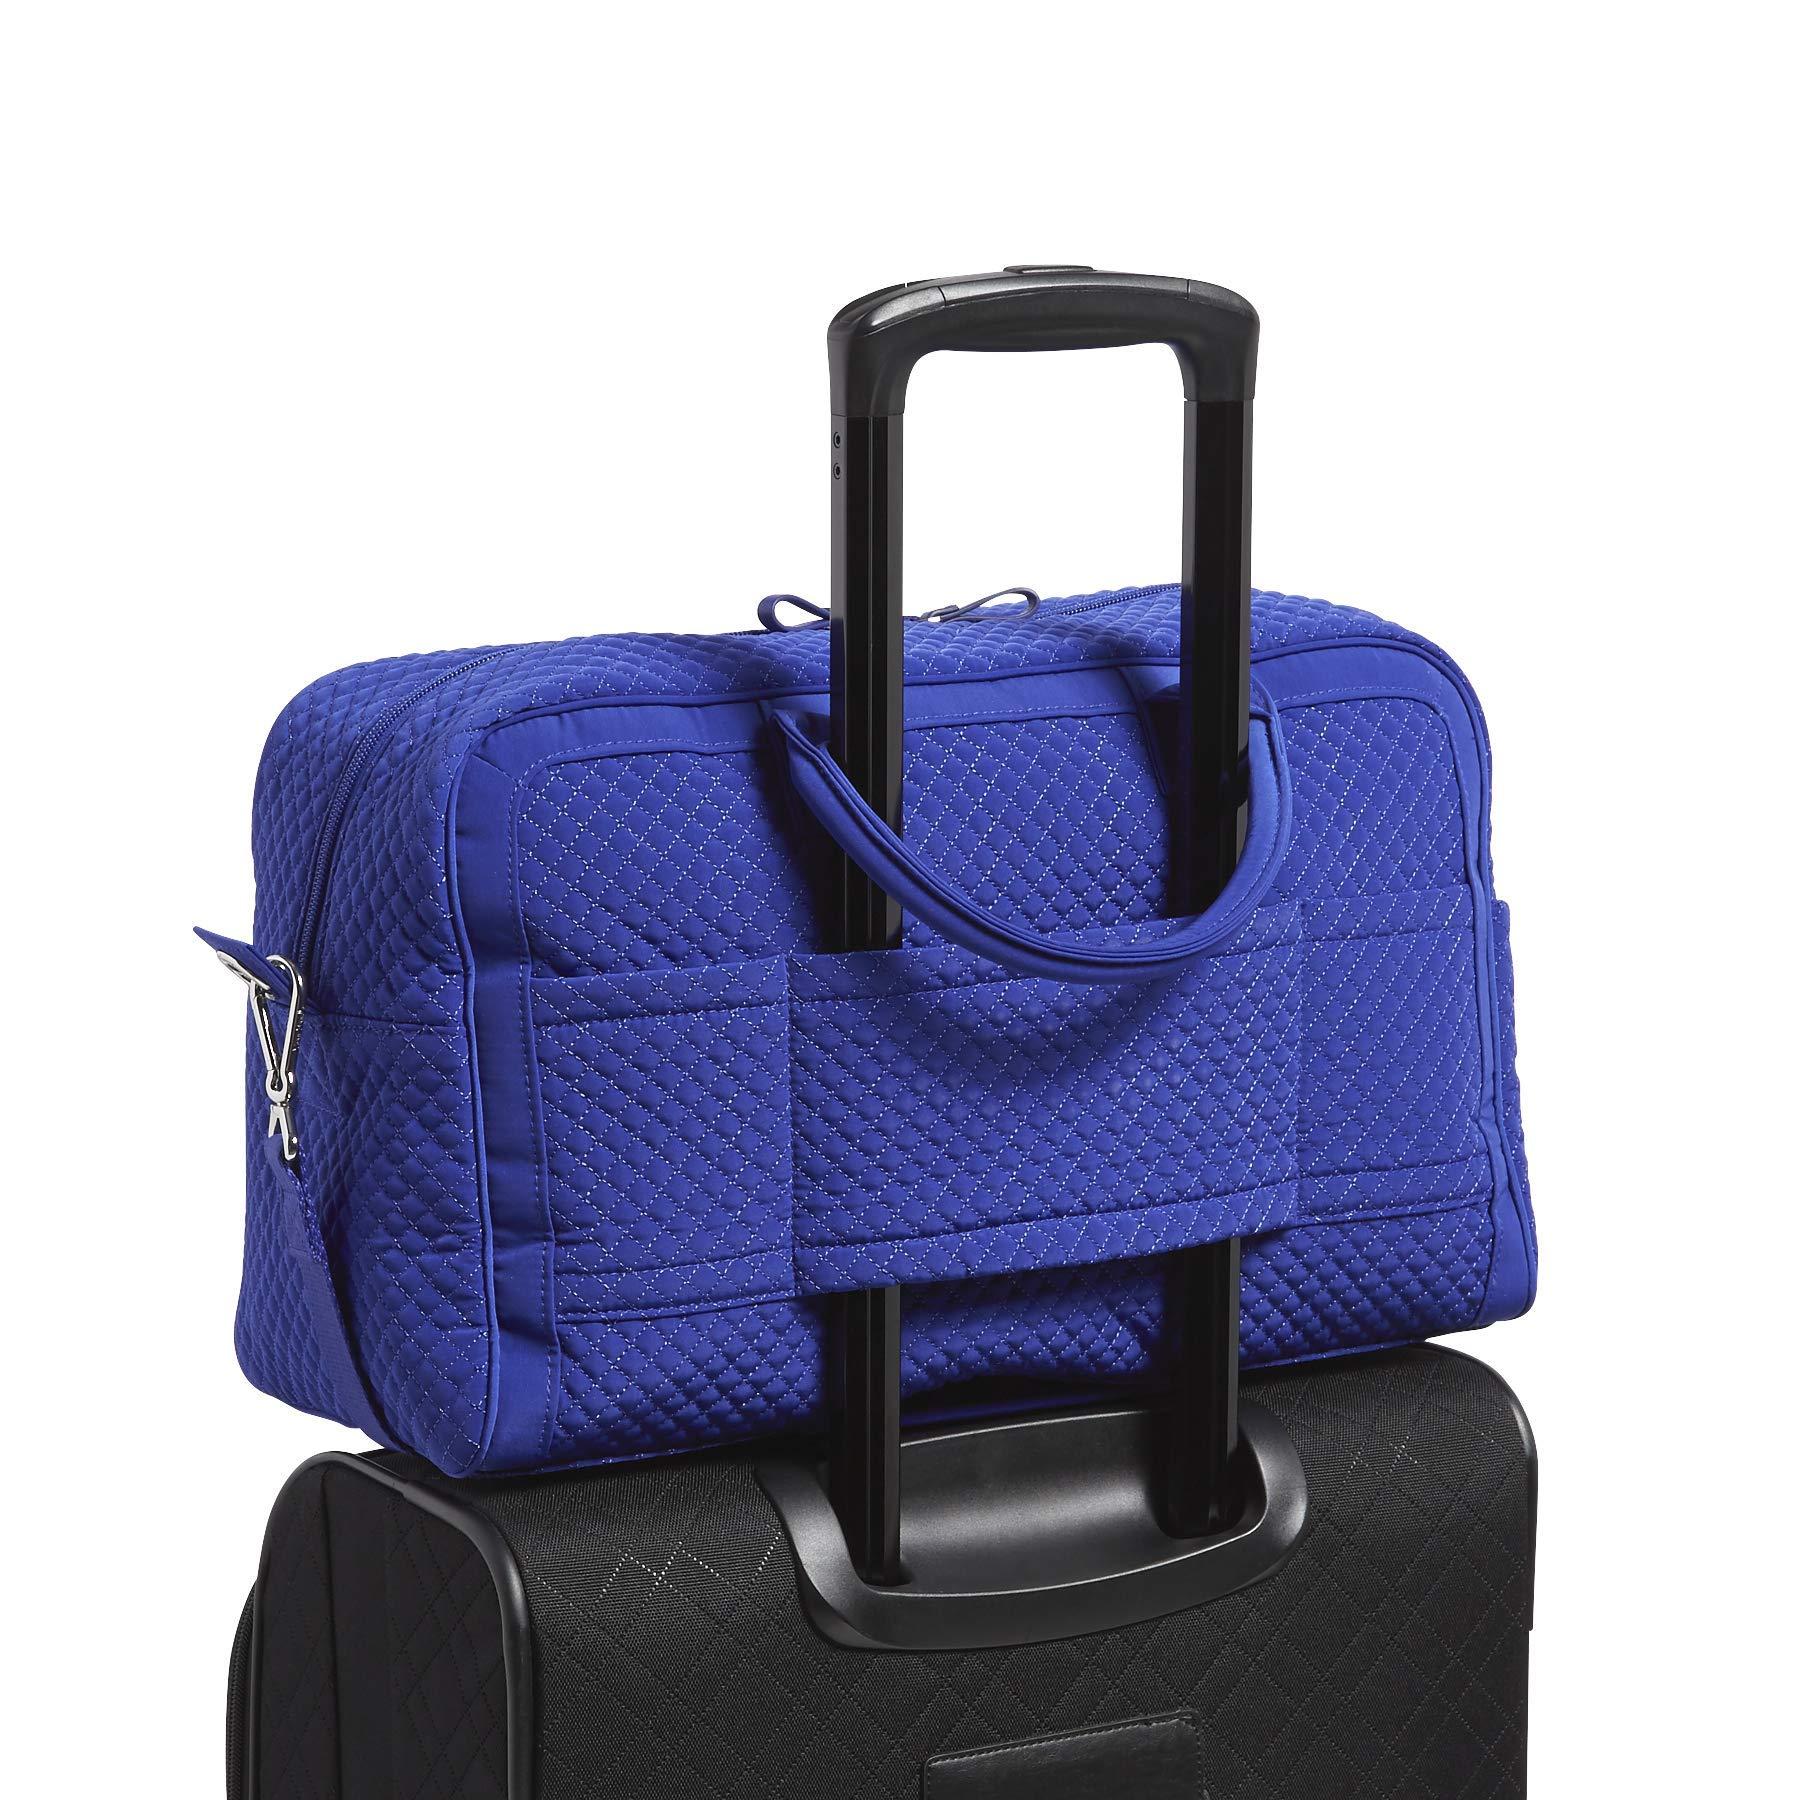 Vera Bradley Iconic Compact Weekender Travel Bag Vera,  gage Blue, One Size by Vera Bradley (Image #4)